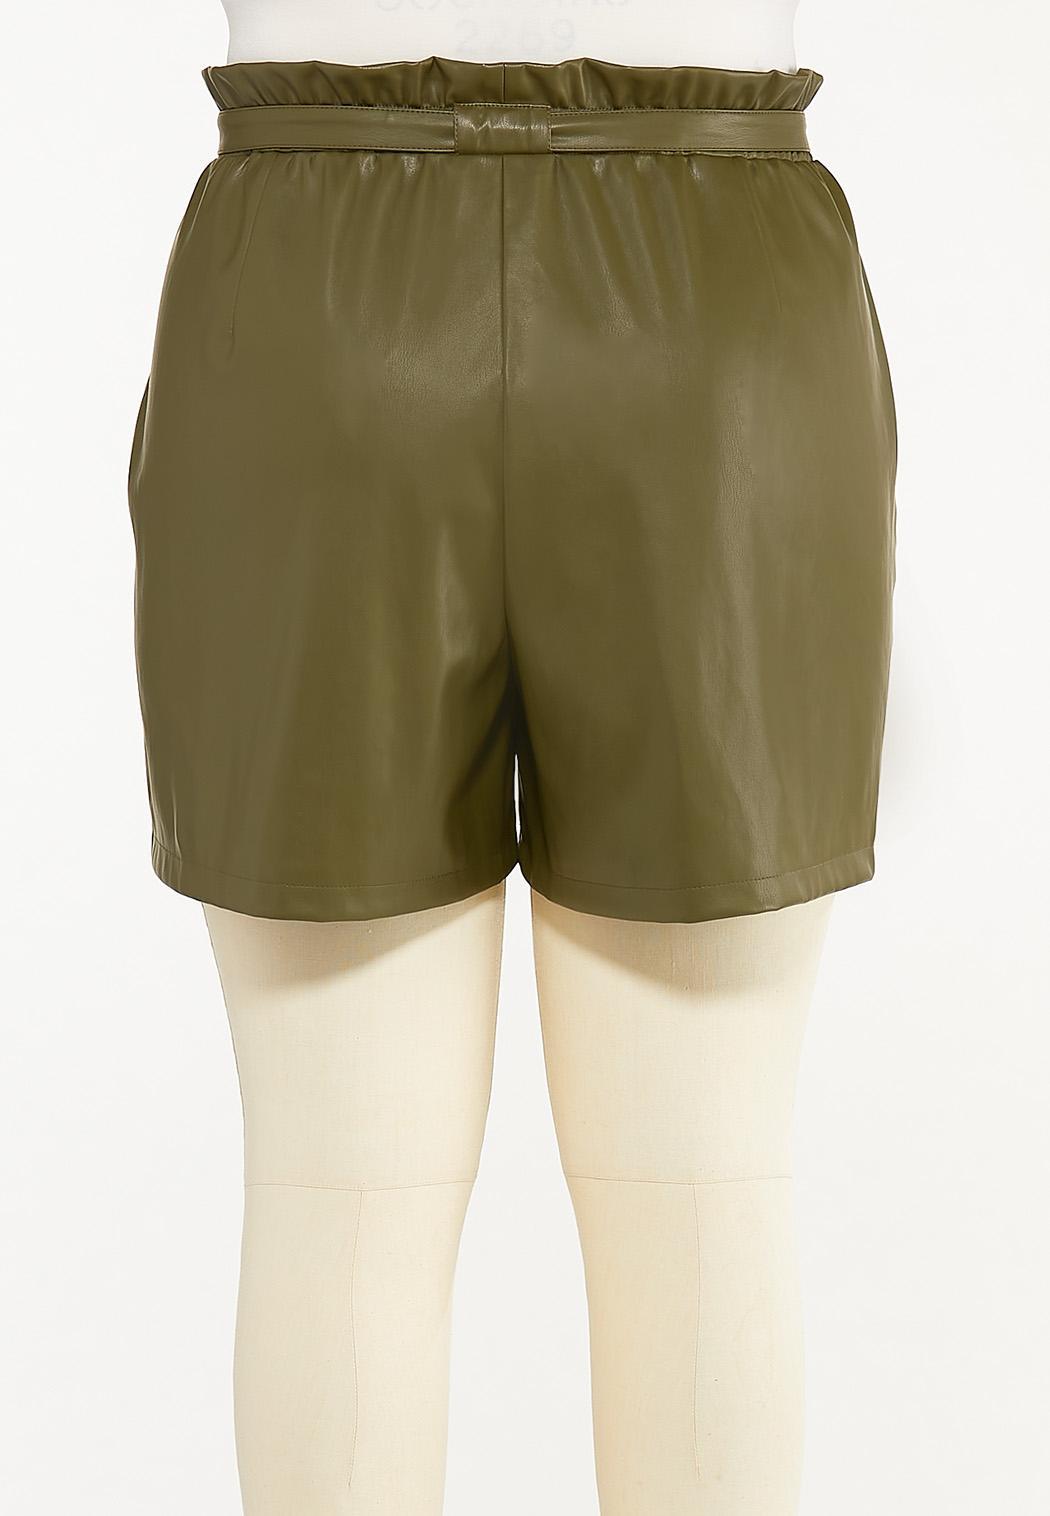 Plus Size Olive Faux Leather Shorts (Item #44570223)